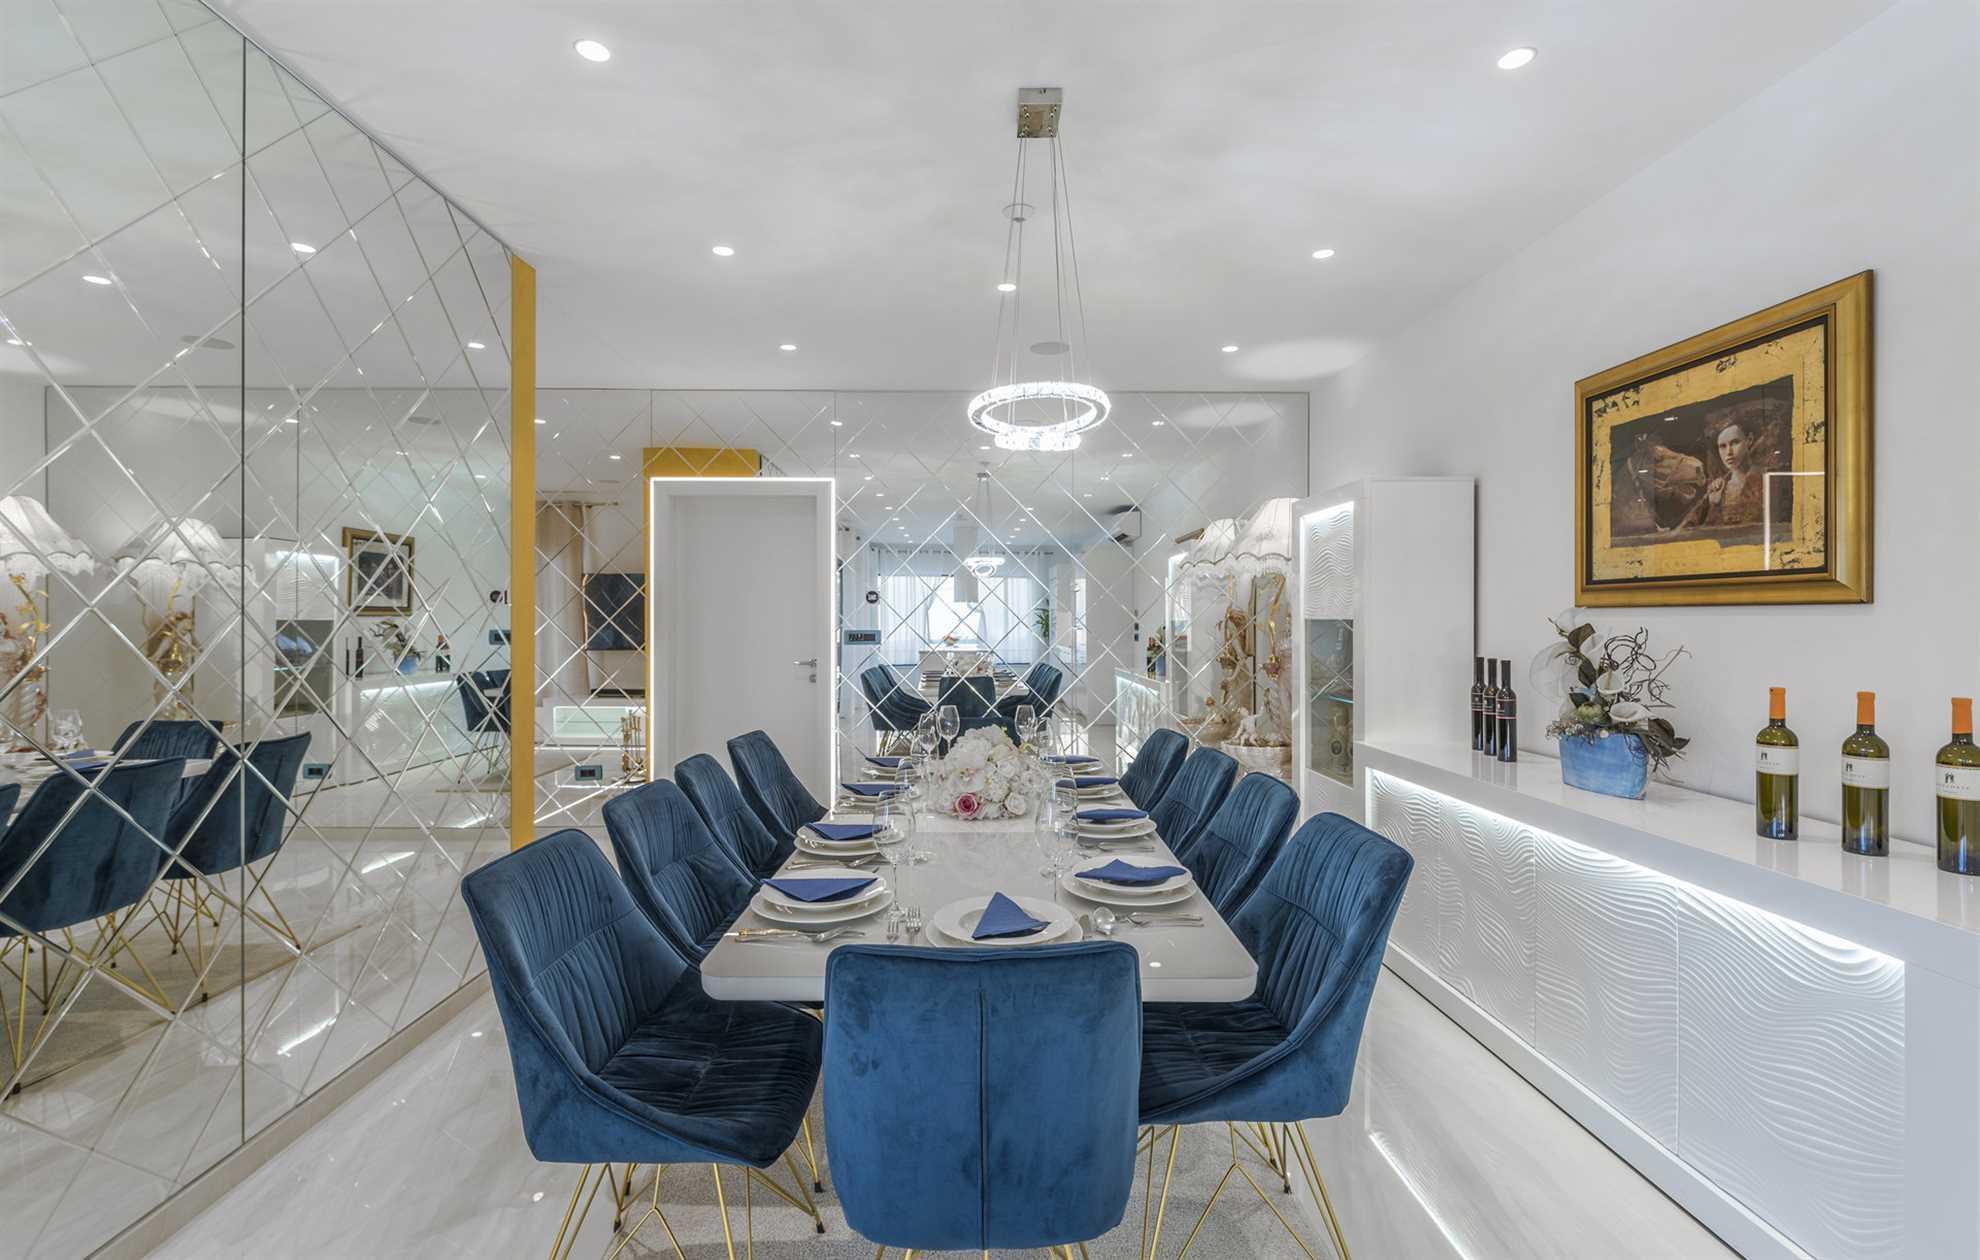 Dining Saloon in Luxury Villa Aurum with pool - luxurious villa rental in Croatia